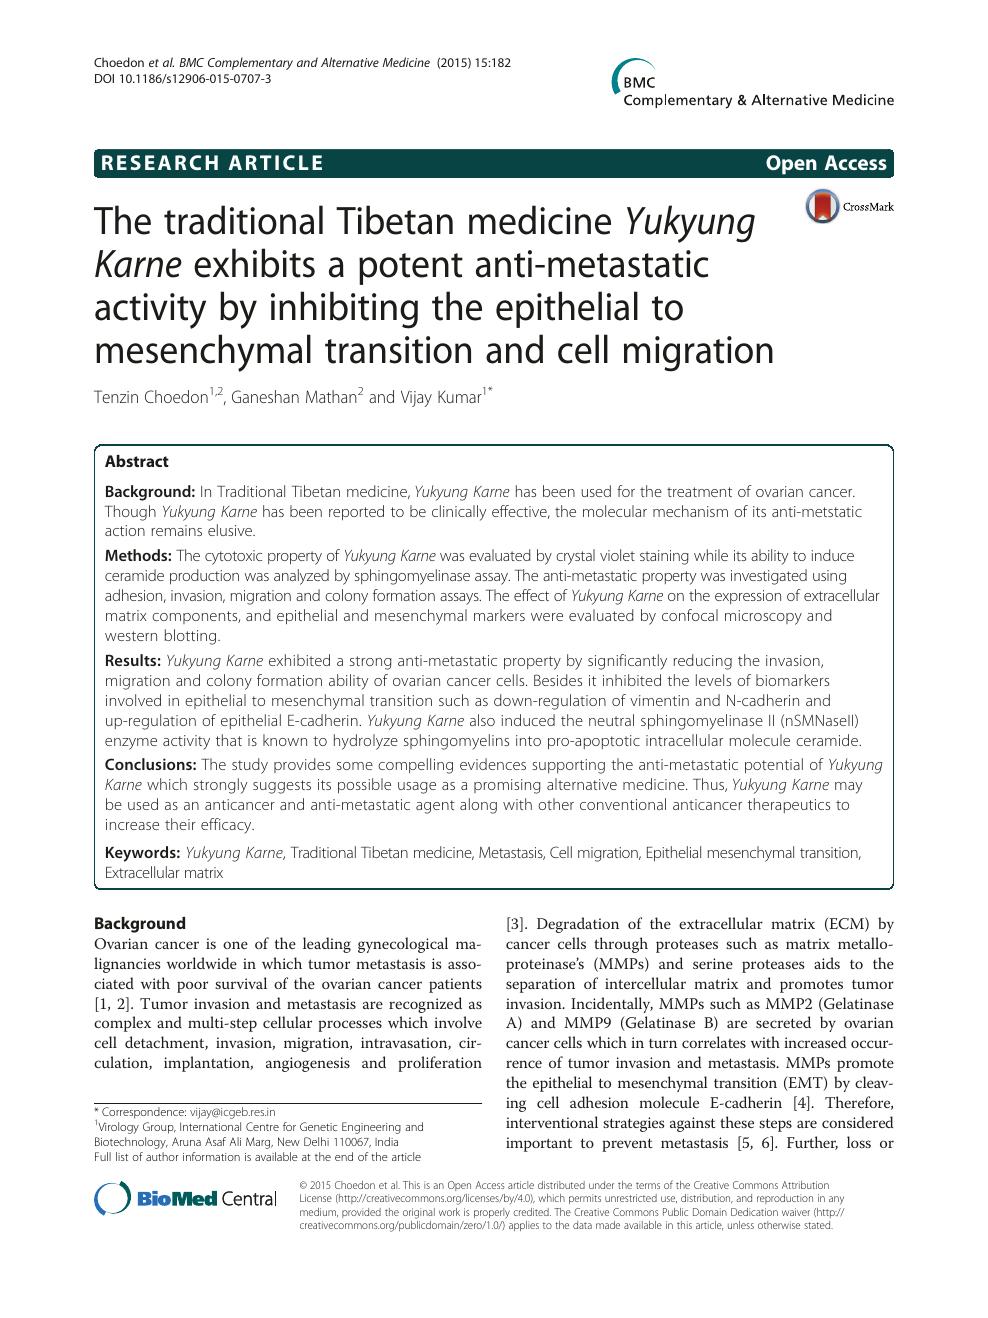 The traditional Tibetan medicine Yukyung Karne exhibits a